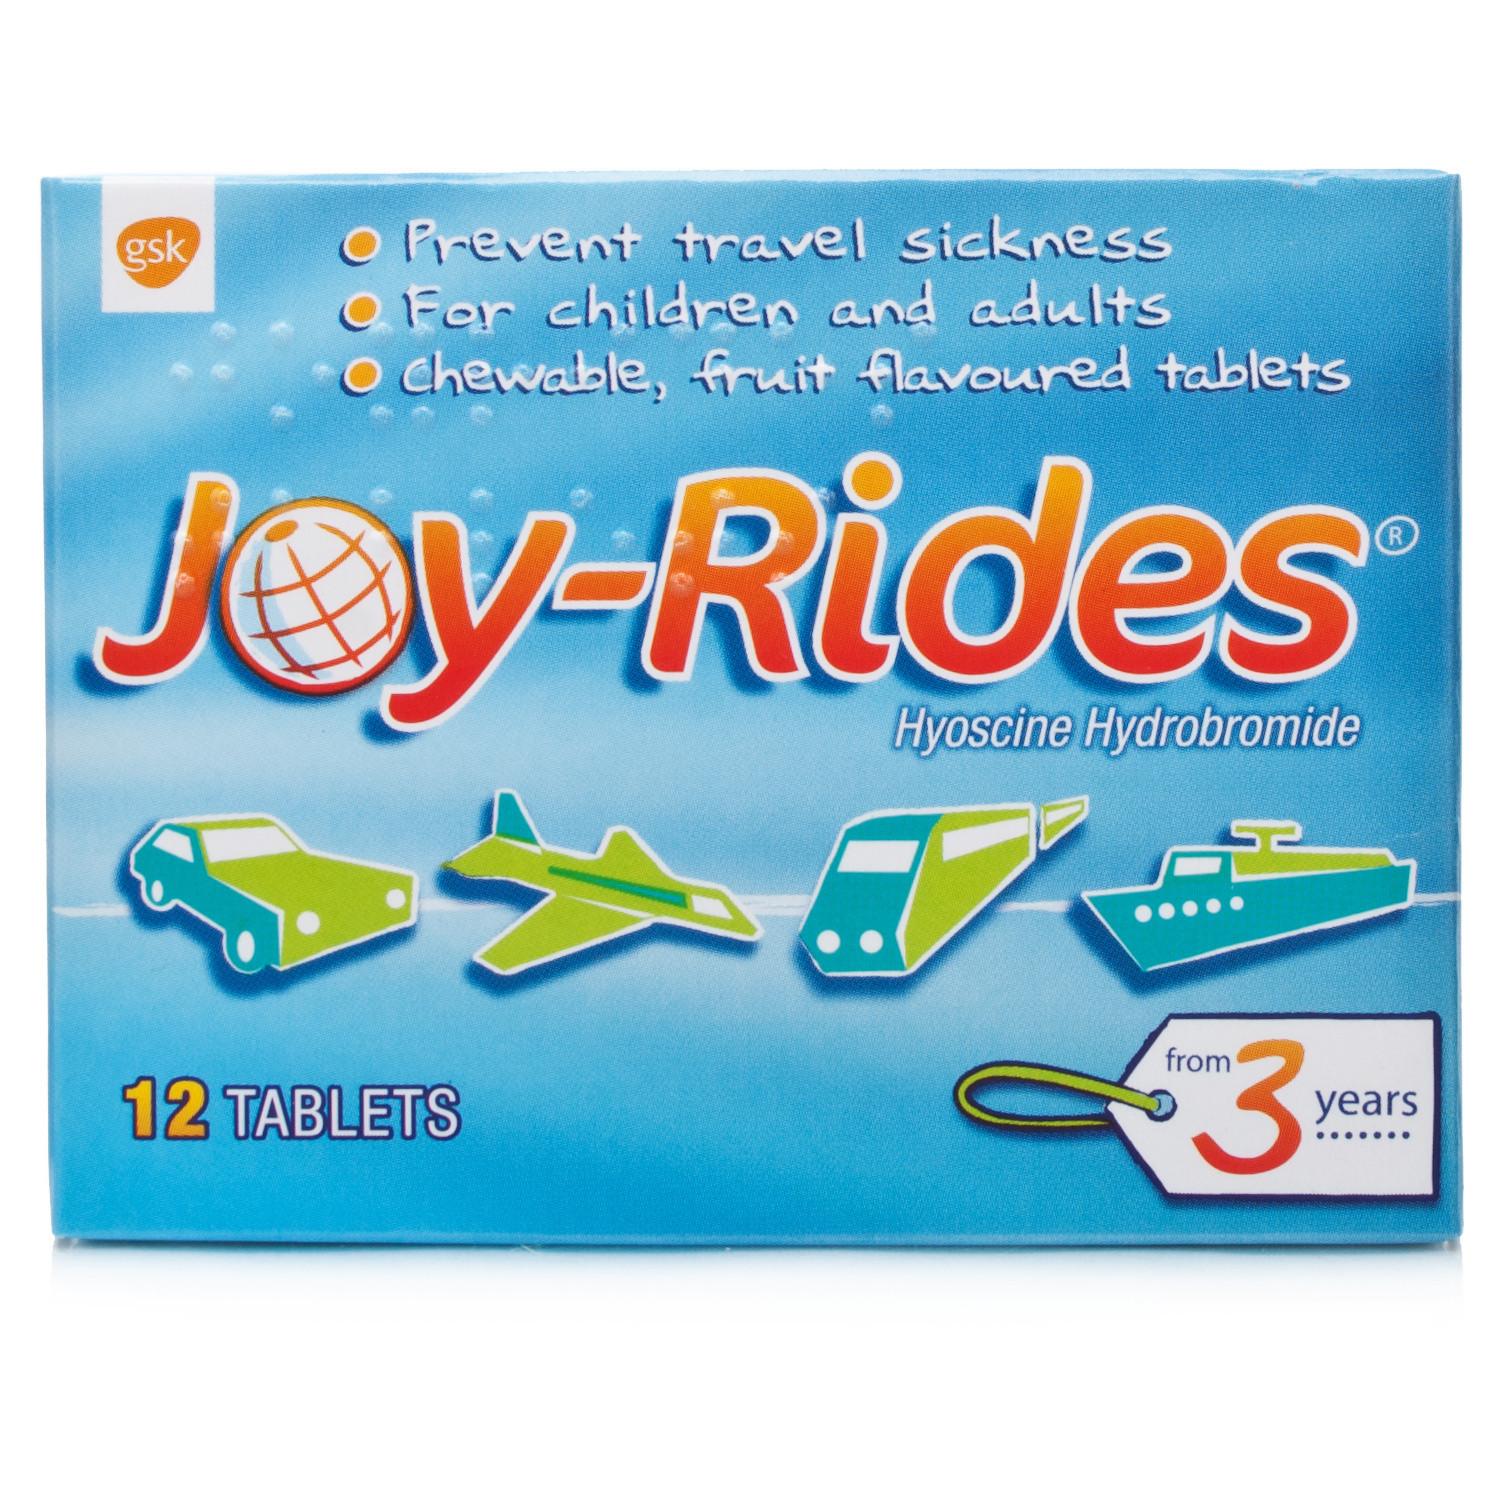 Joy Rides Travel Sickness Tablets